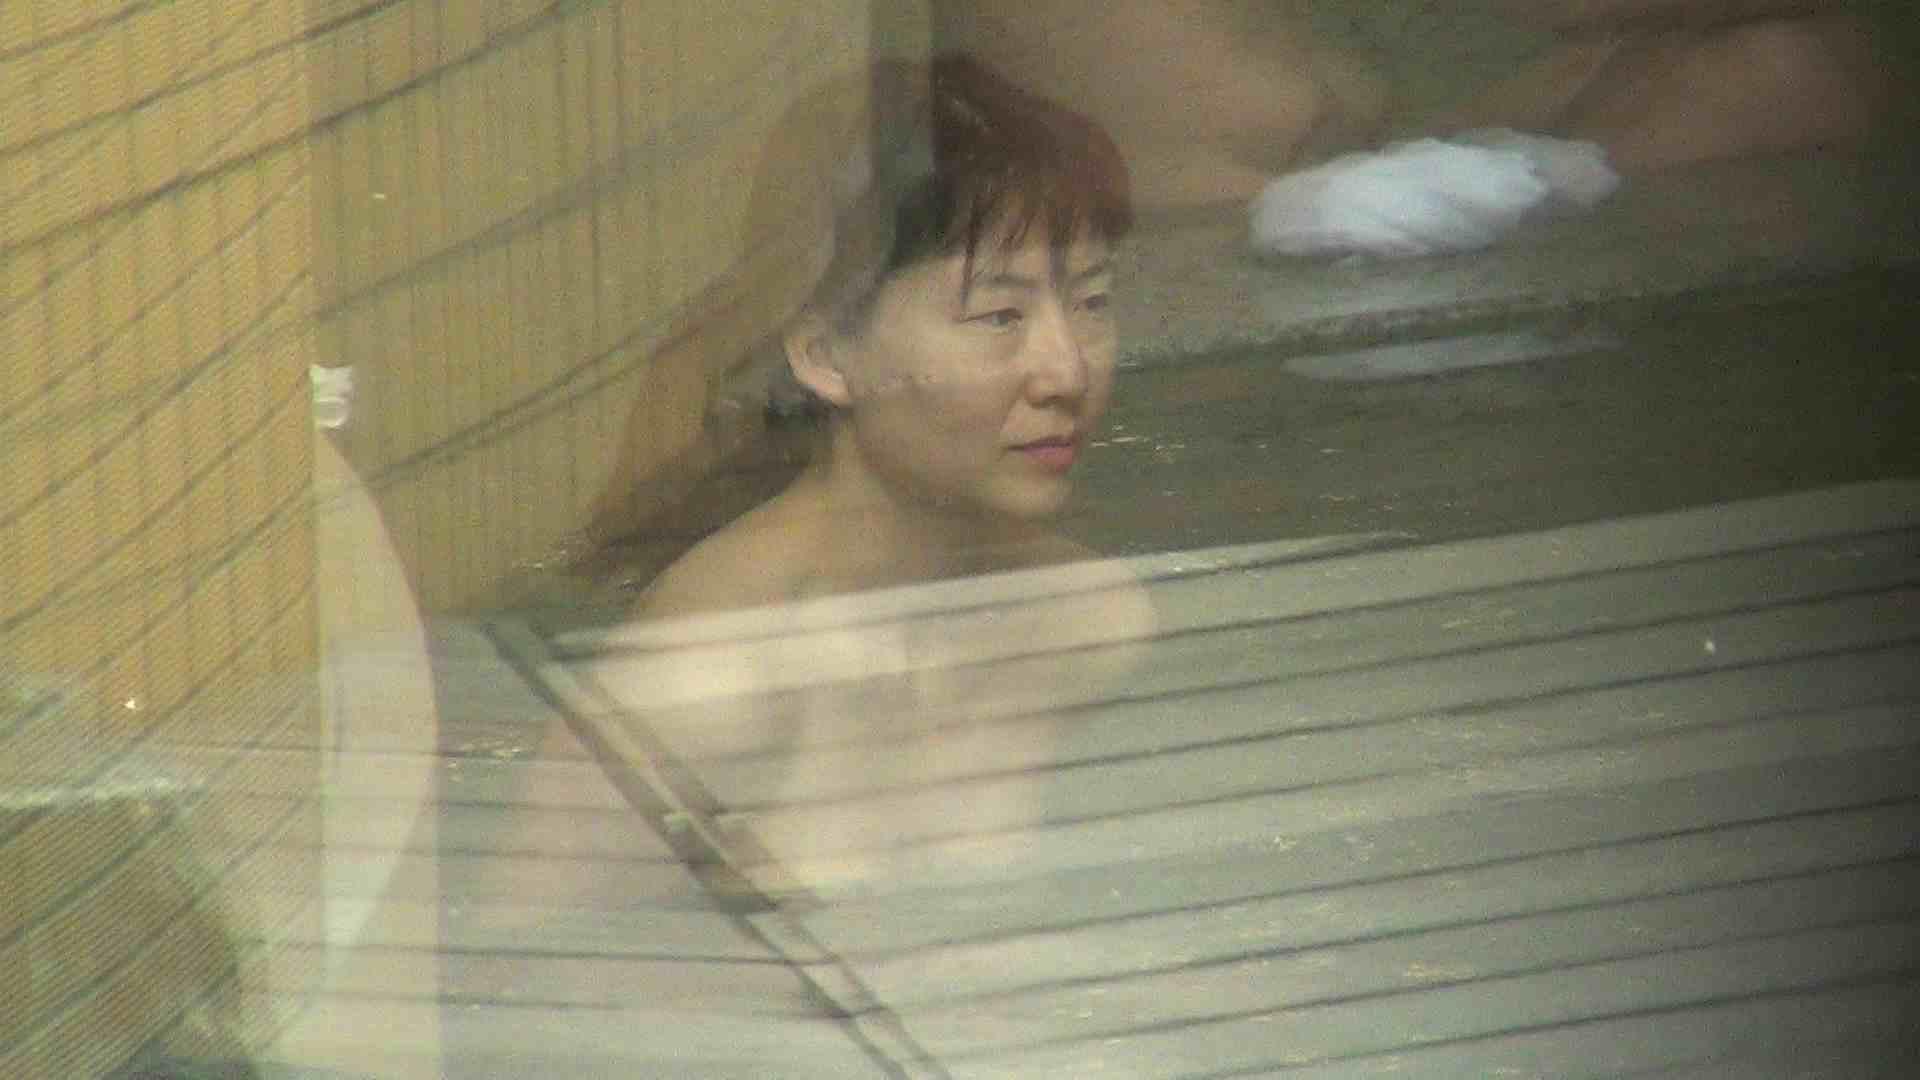 Aquaな露天風呂Vol.299 盗撮シリーズ | 露天風呂編  82PIX 53